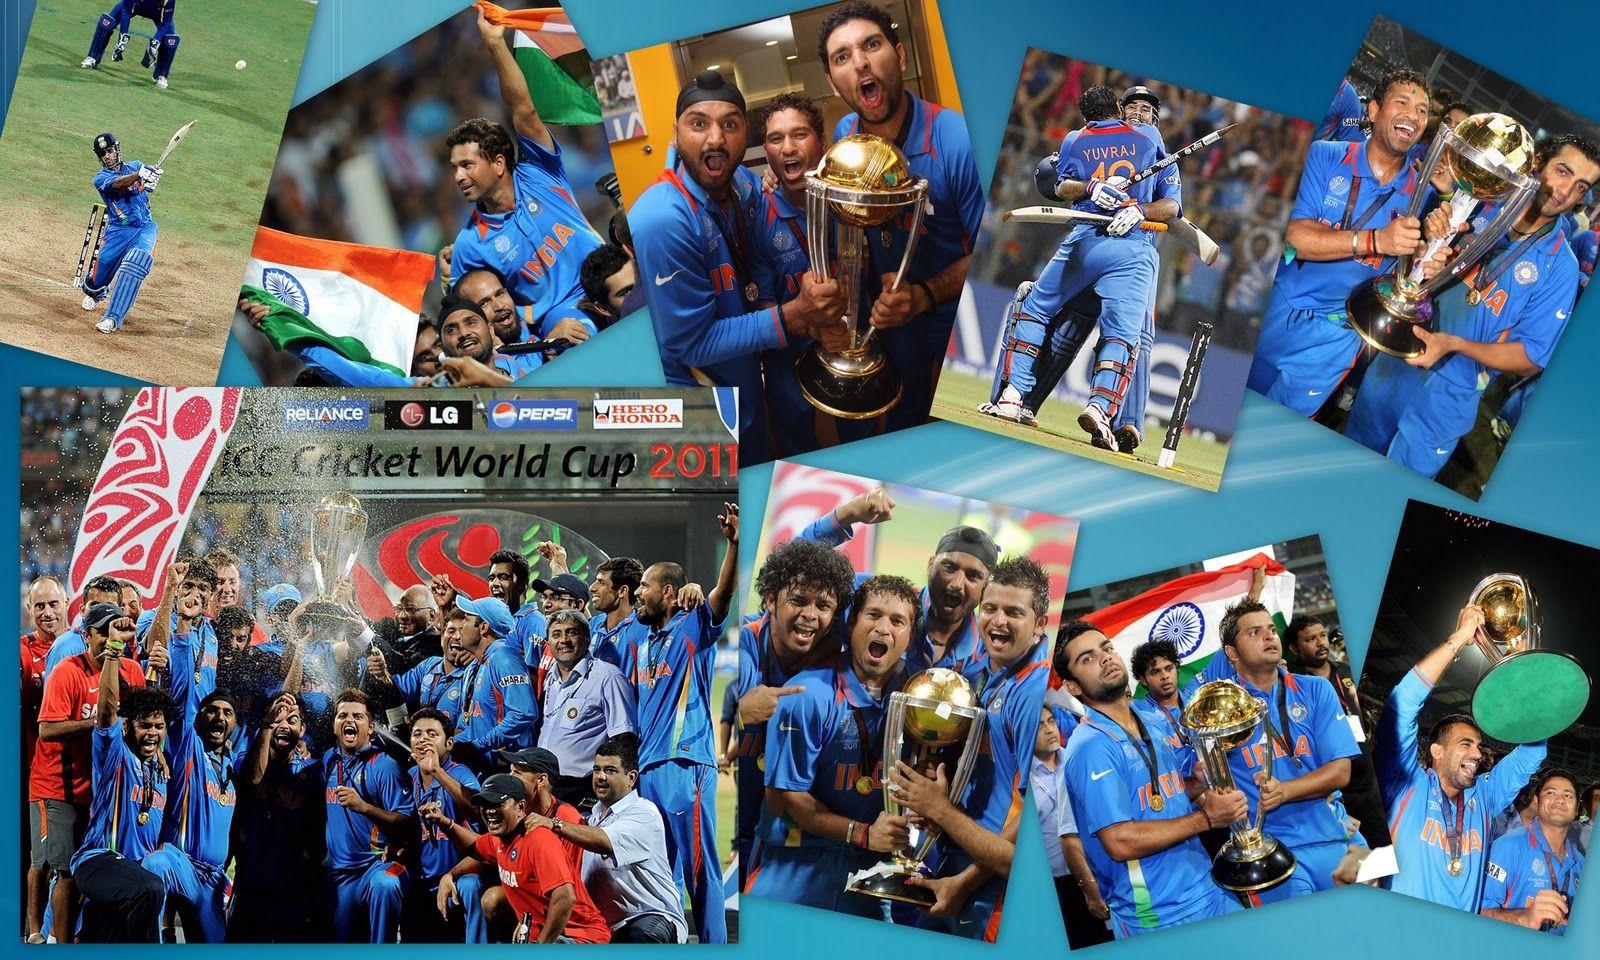 Wallpaper Team India National Cricket Team Indian: Indian Cricket Team Wallpapers : Find Best Latest Indian